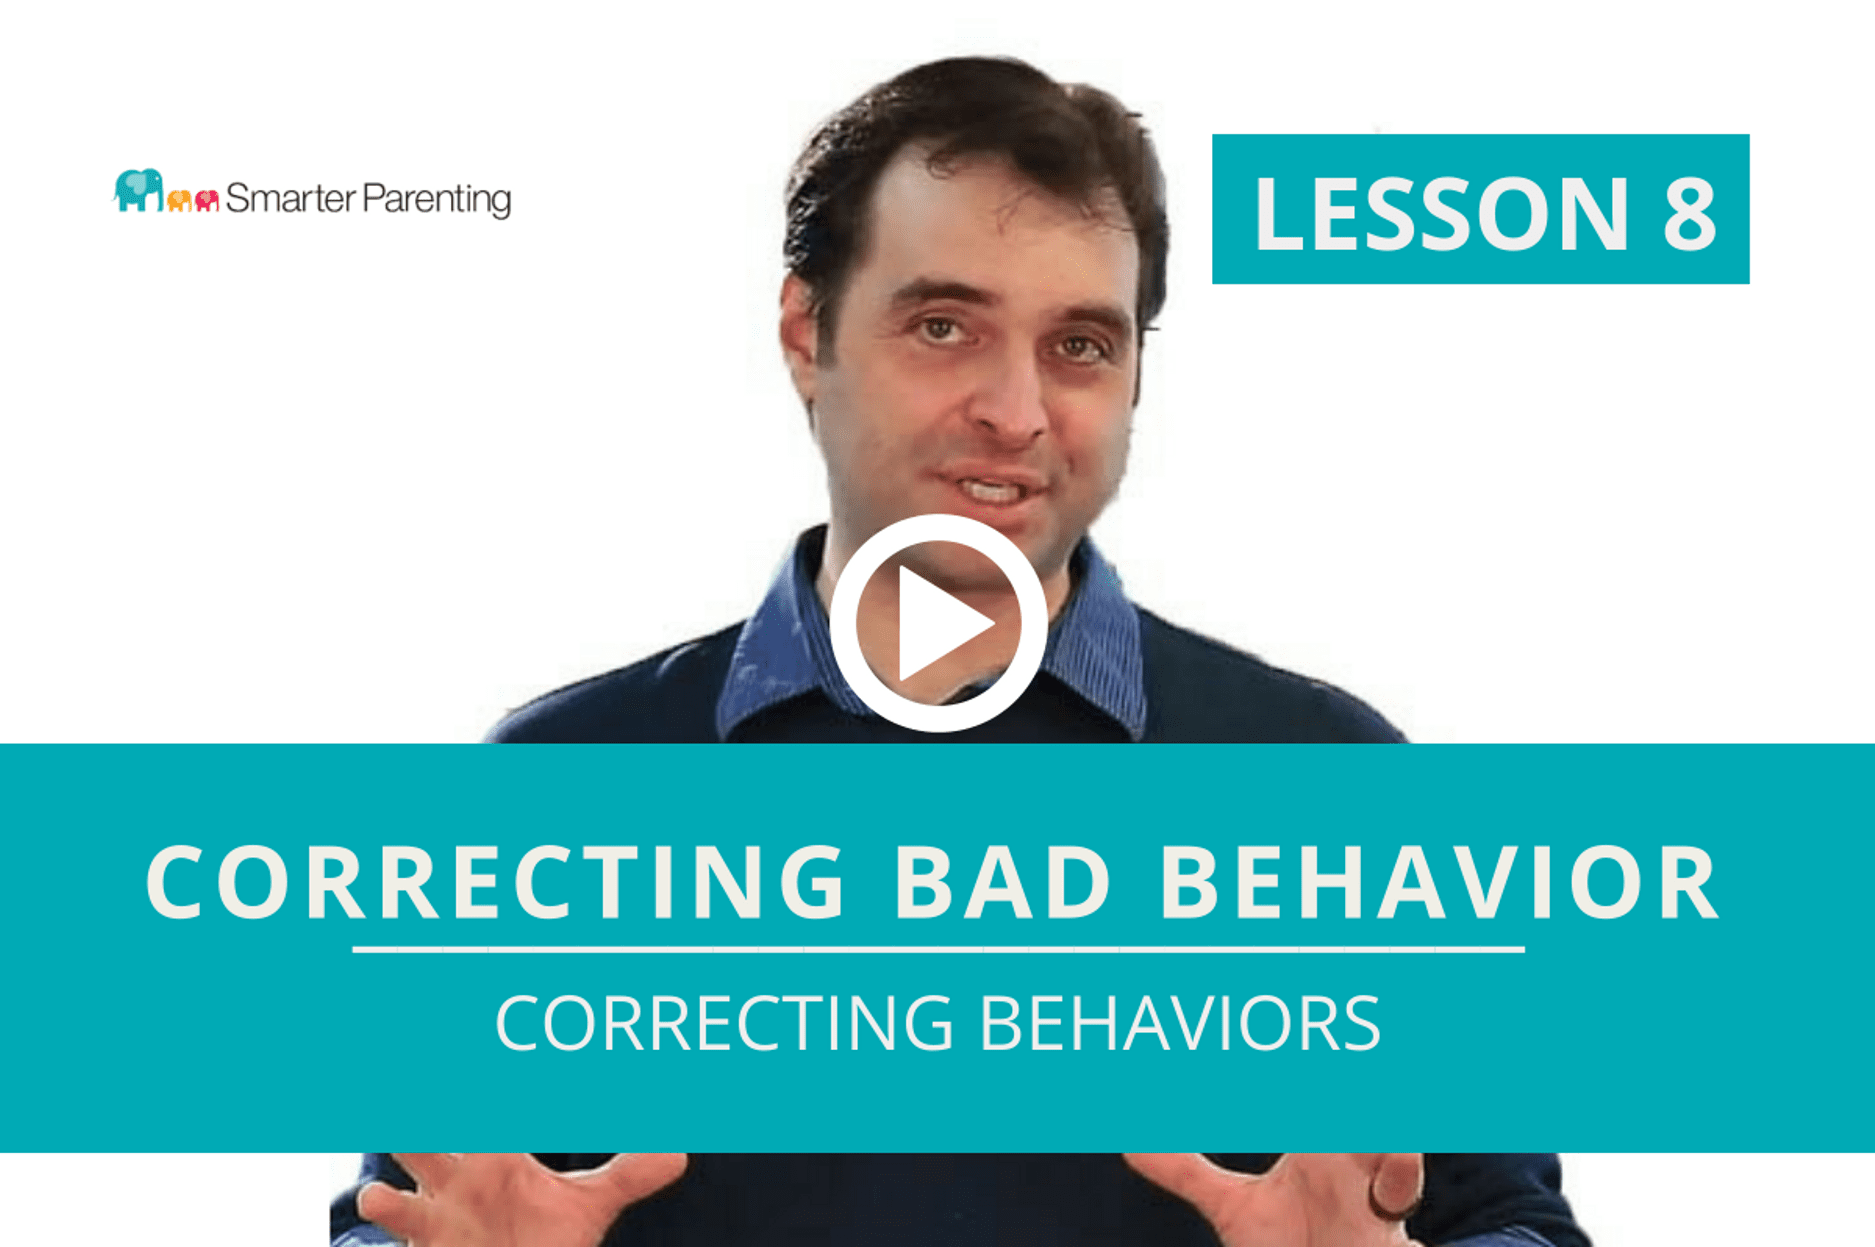 Correcting Behaviors lesson link